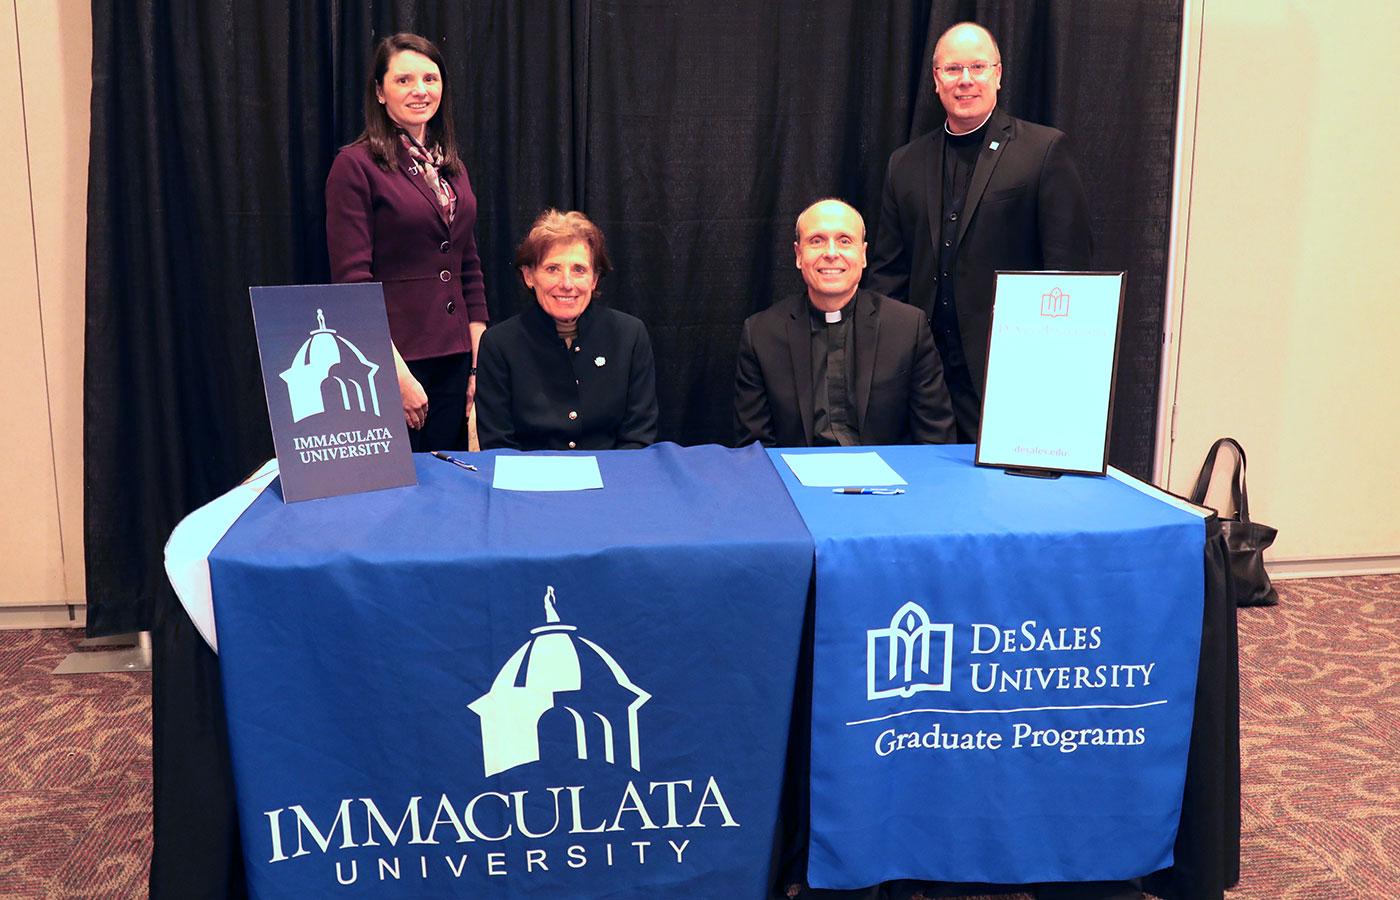 Immaculata Partnership